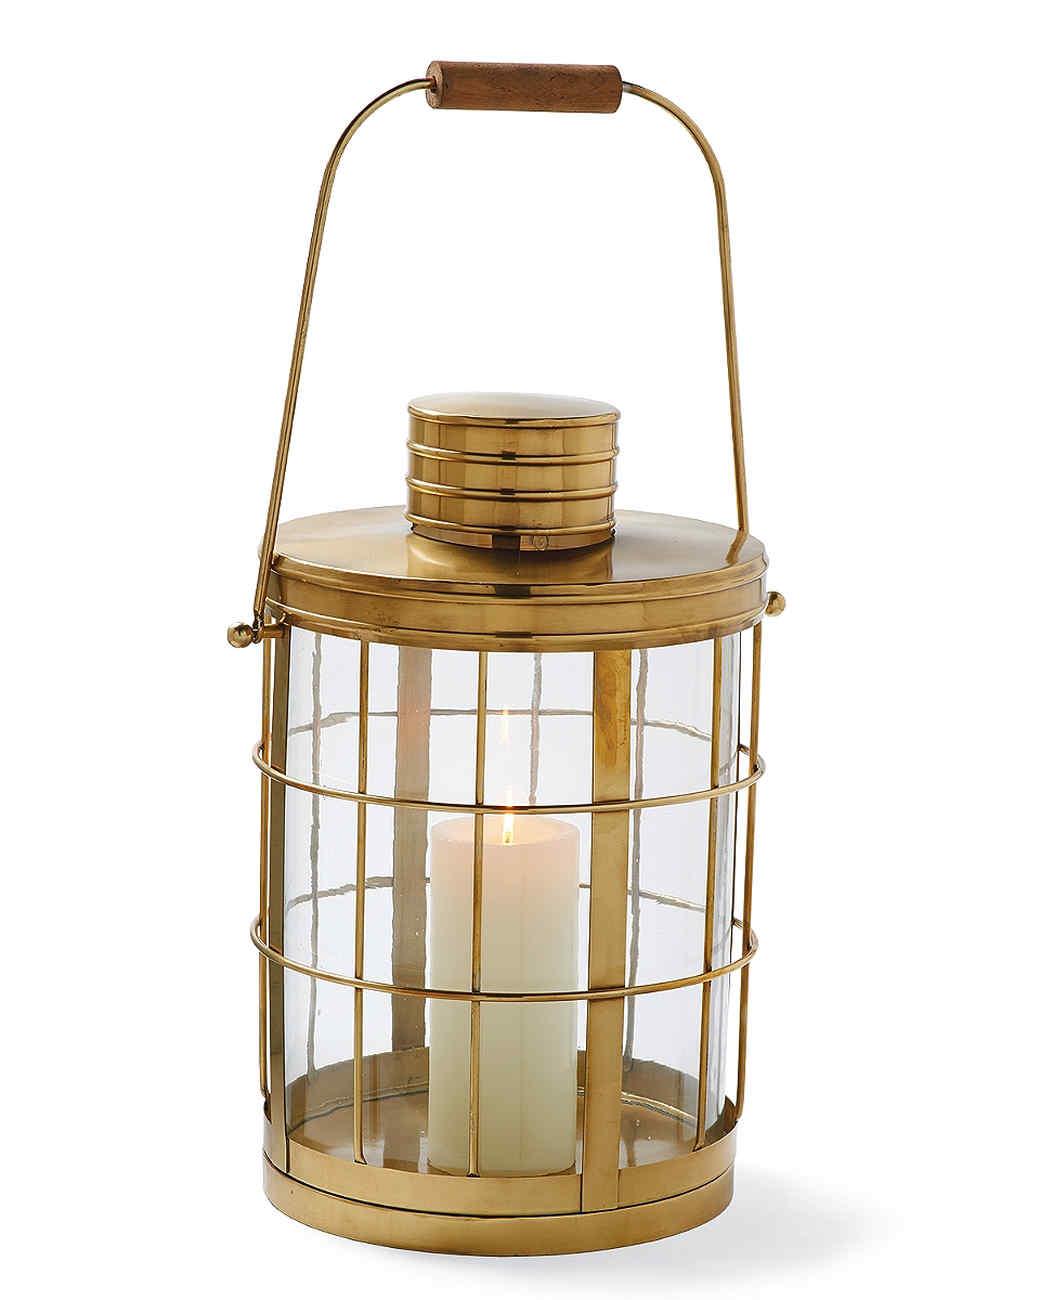 frontgate-lantern.jpg